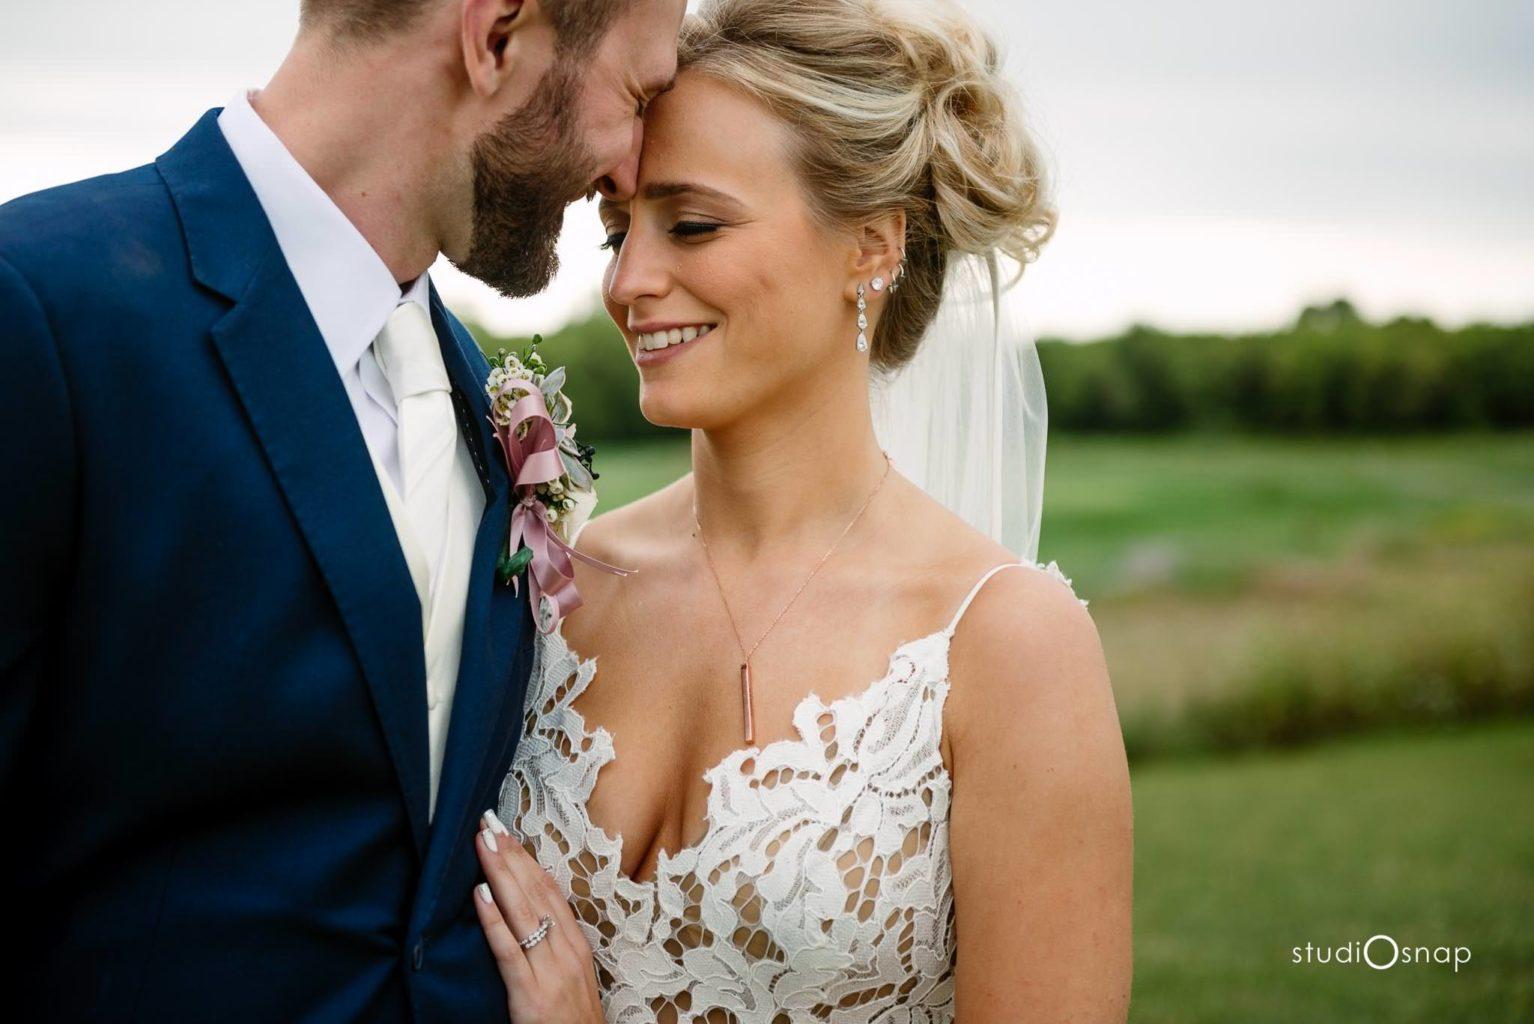 Cheap Wedding Photography Plymouth: Fox Hills Summerhouse, Plymouth